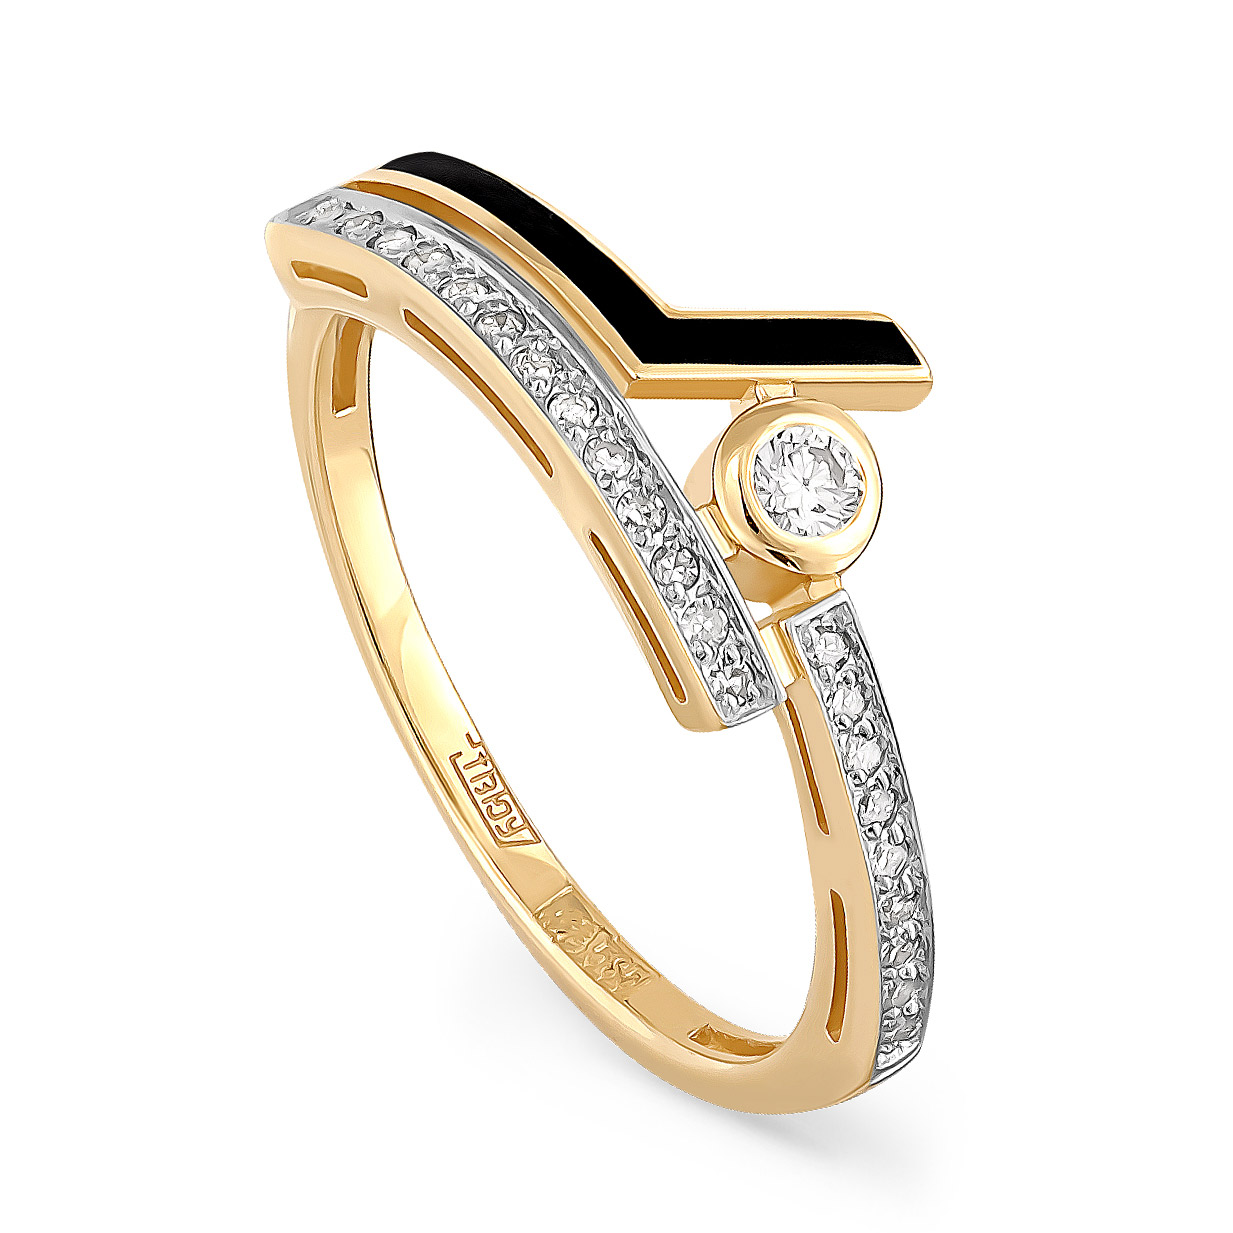 Кольцо из лимонного золота Бриллиант арт. 11-21050-1002 11-21050-1002